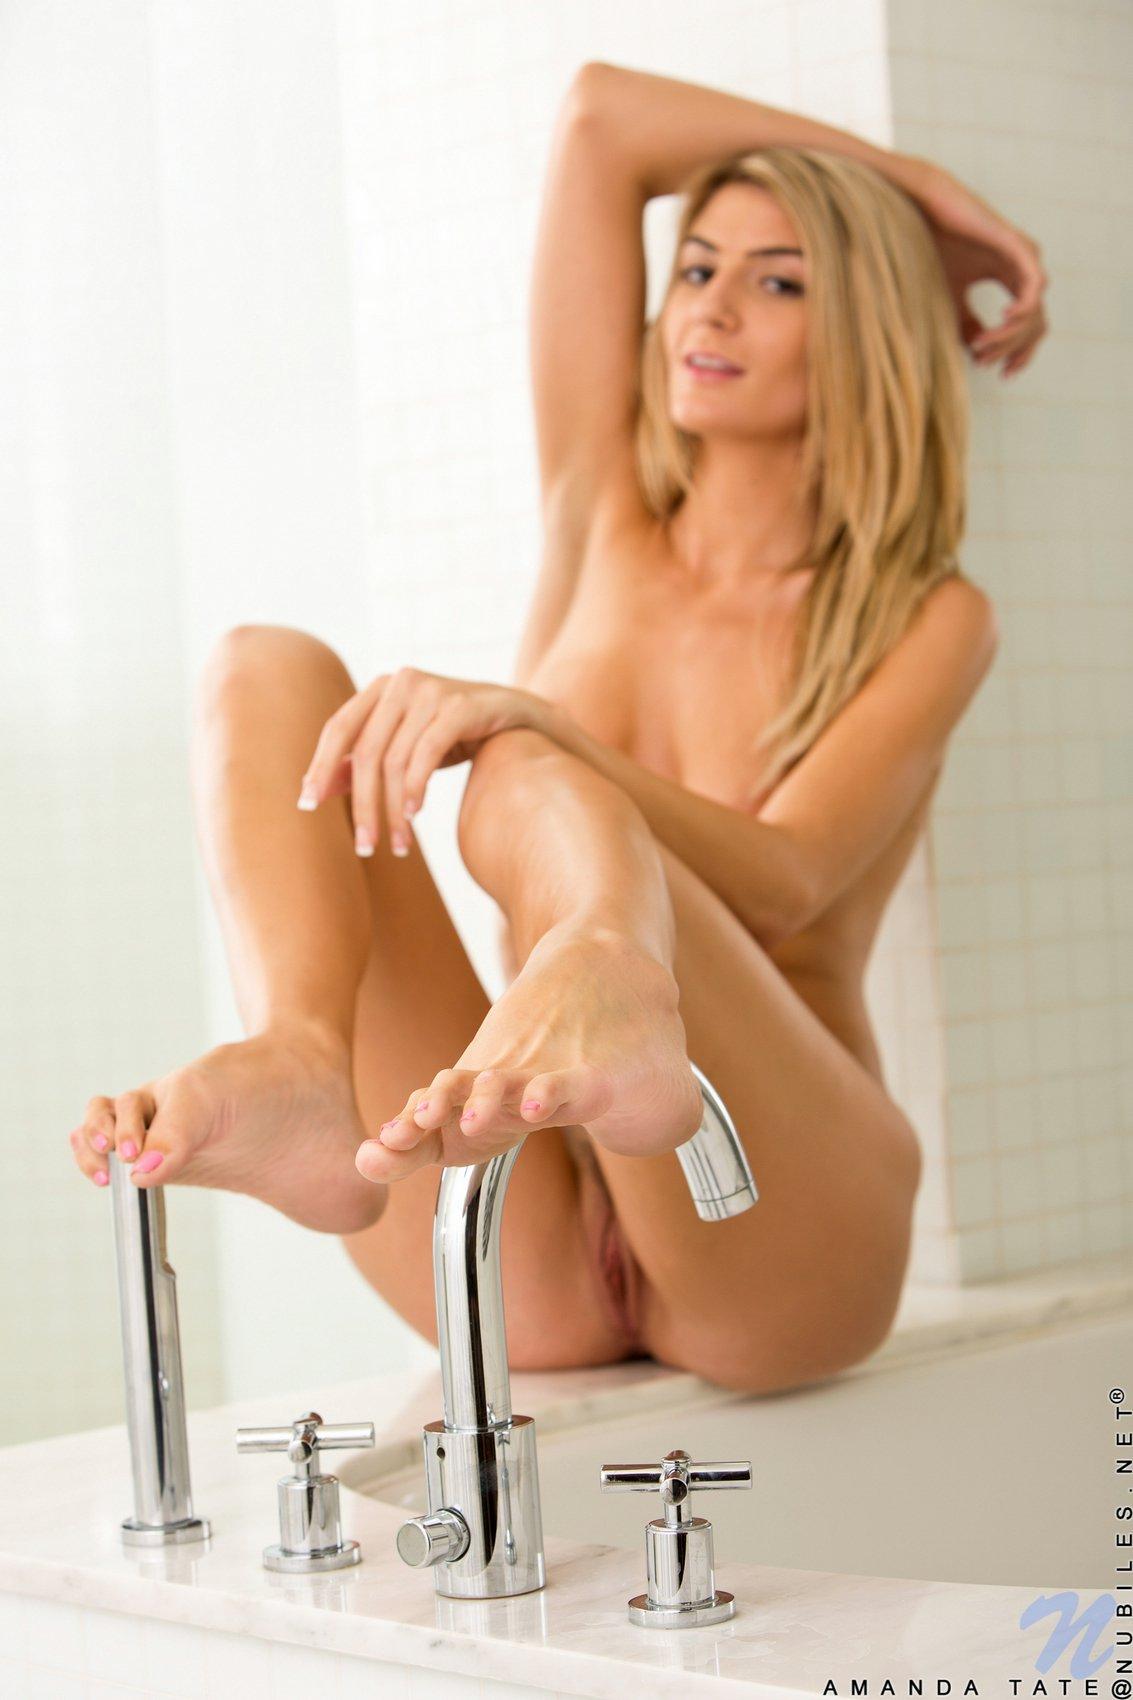 Amanda Tate posing for your pleasure in the bathroom - My ...